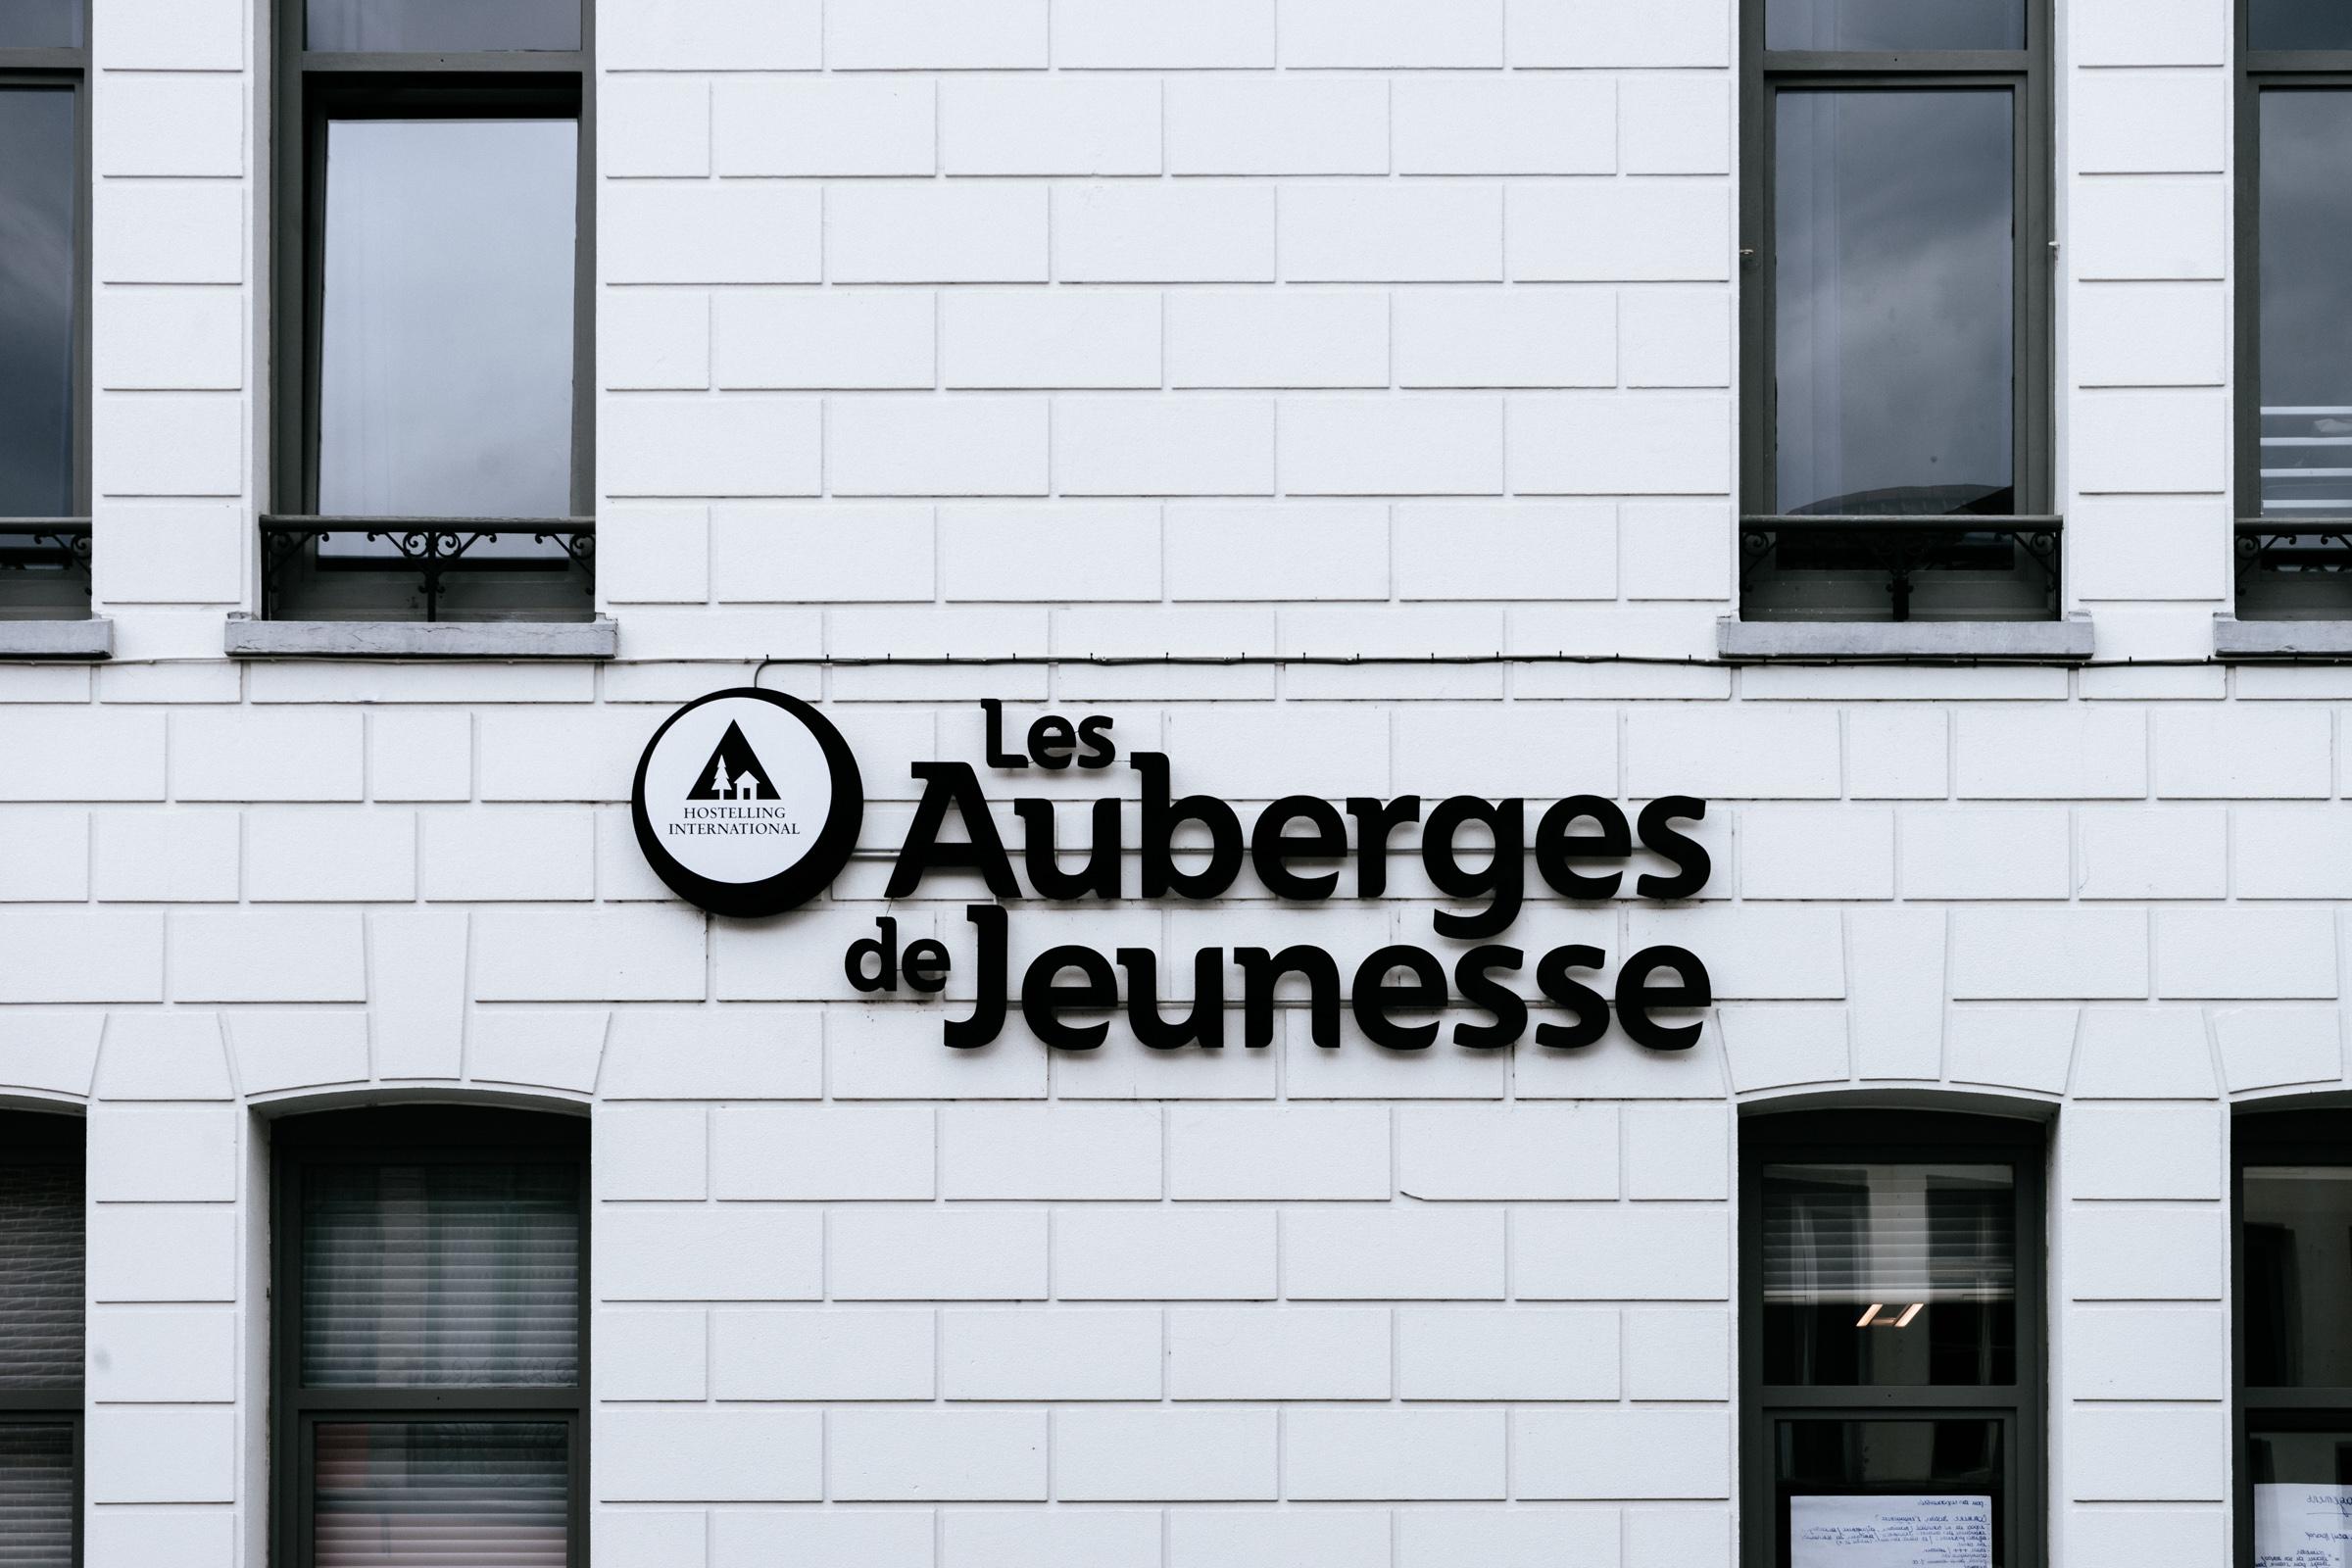 Le sigle de l'Auberge de Jeunesse de Tournai